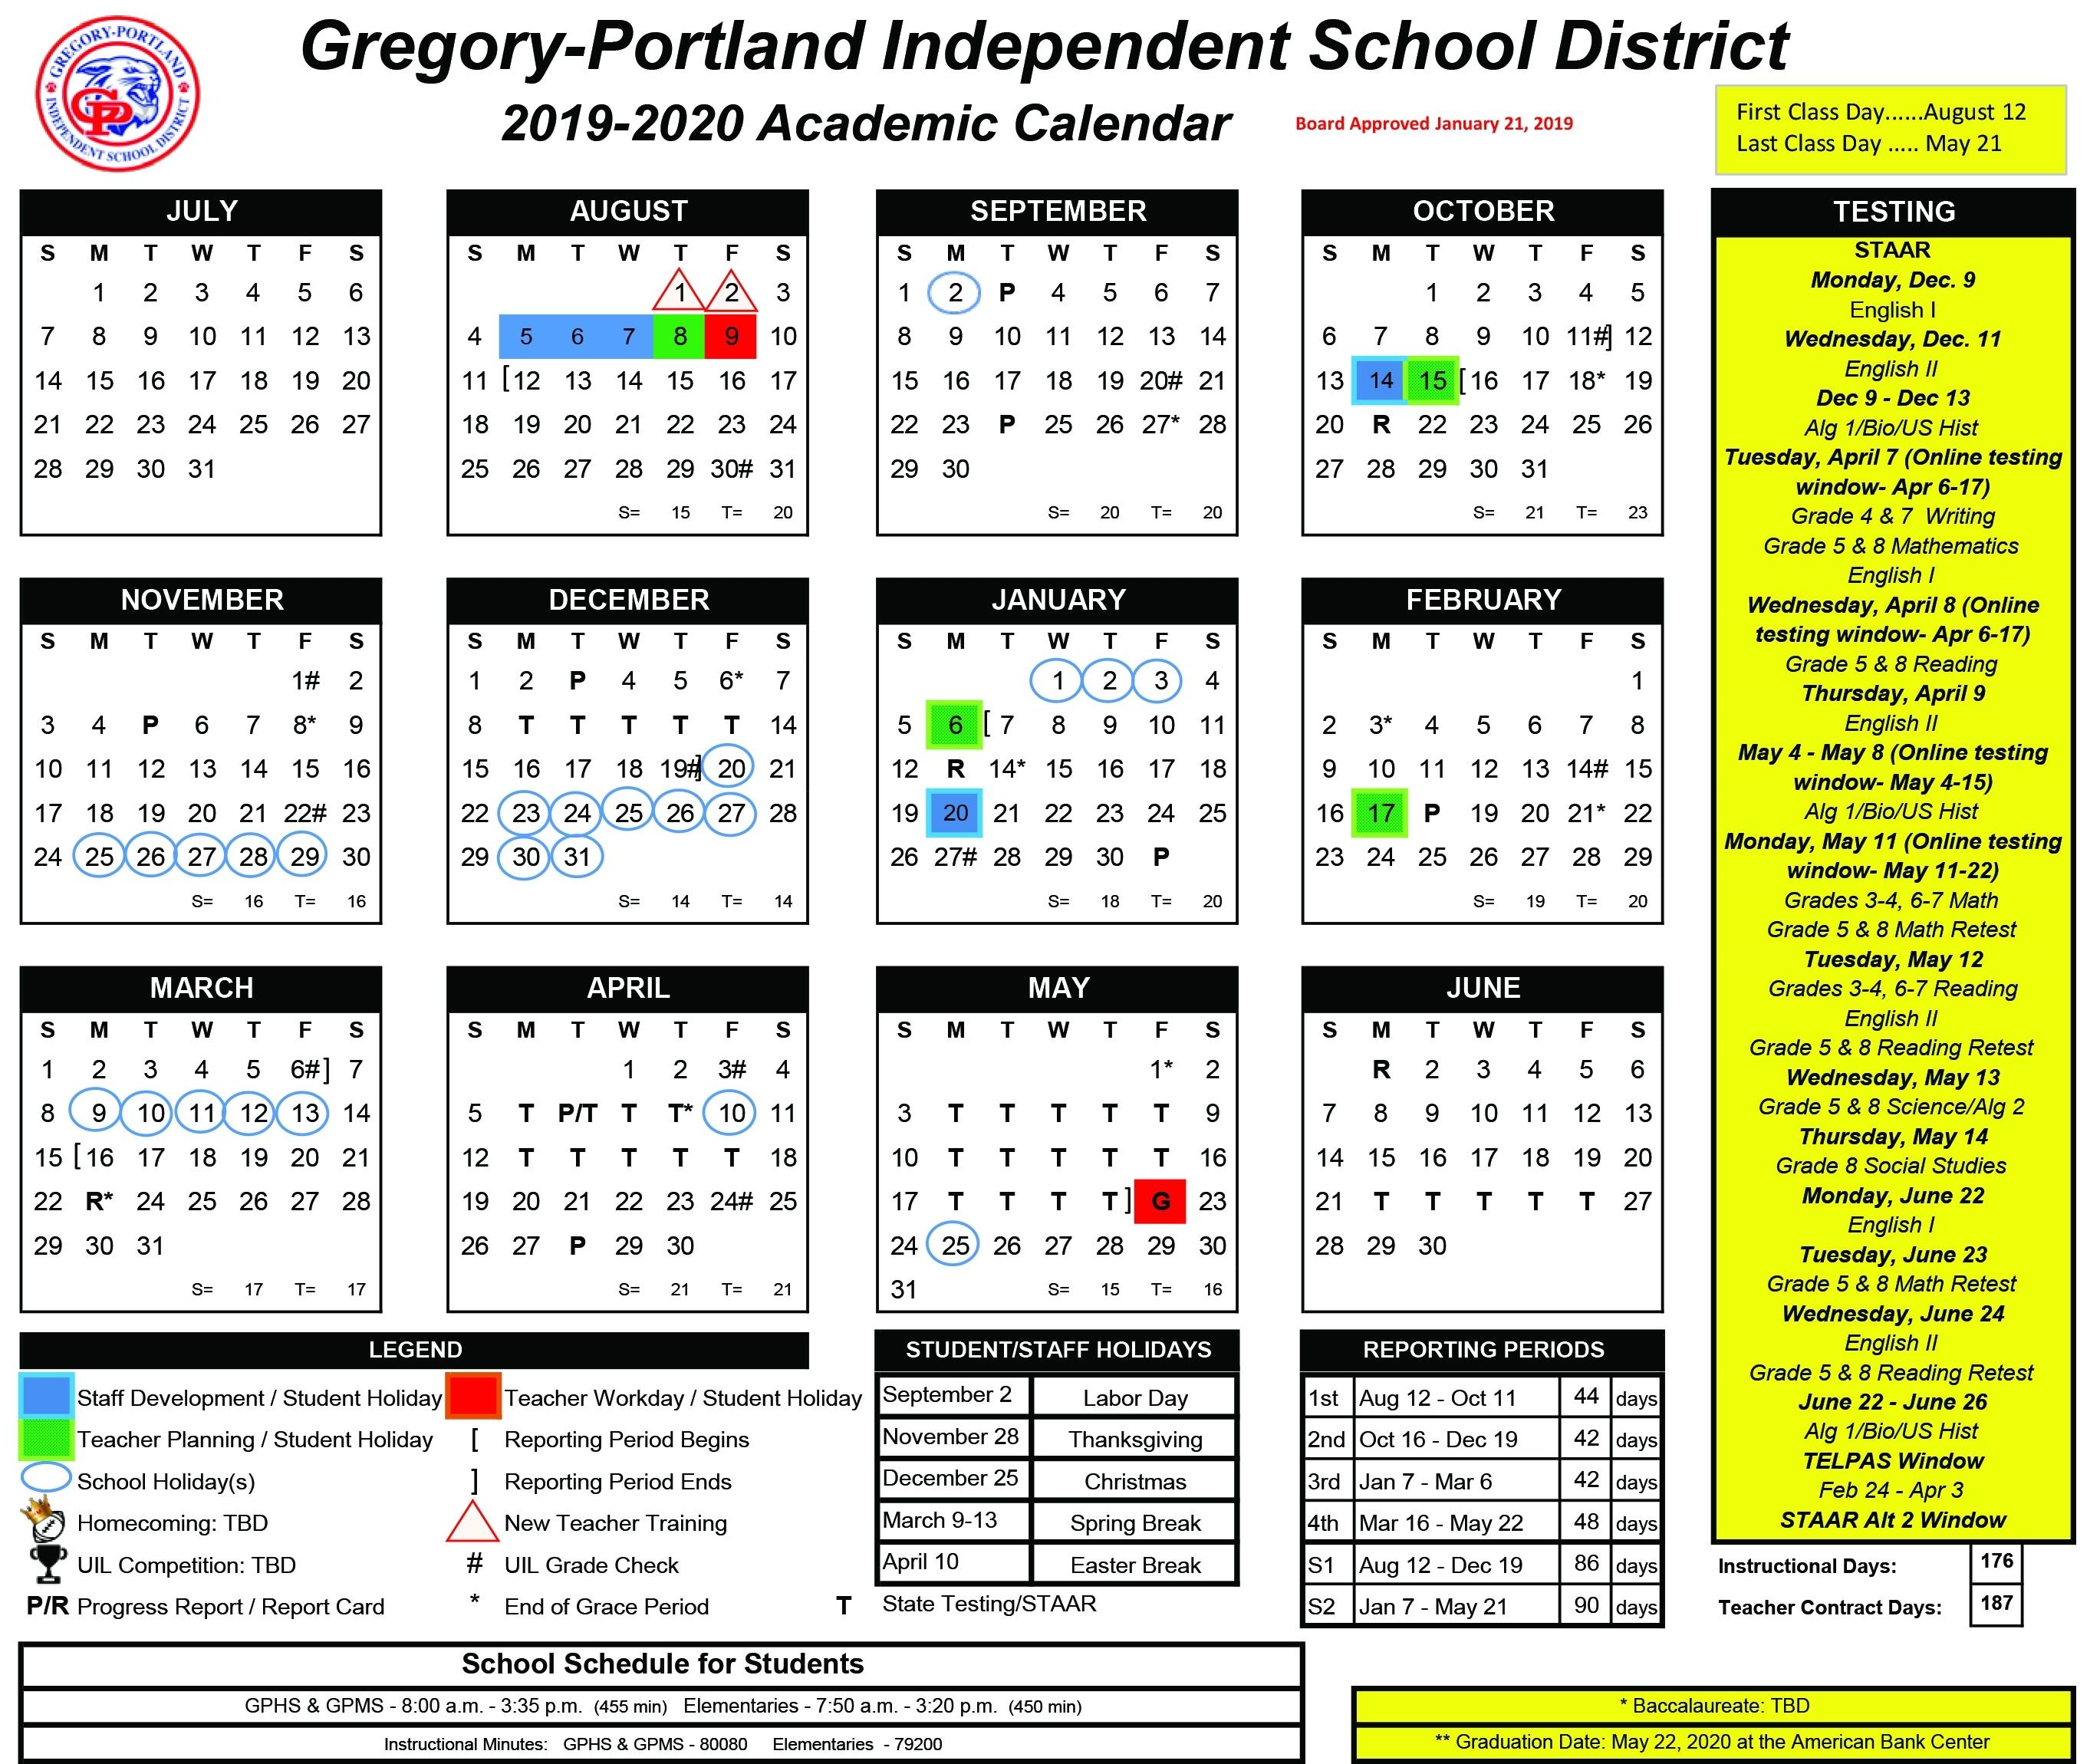 District Calendar, 2019-20 - Gregory-Portland Independent School regarding Special Days Calendar 2019-2020